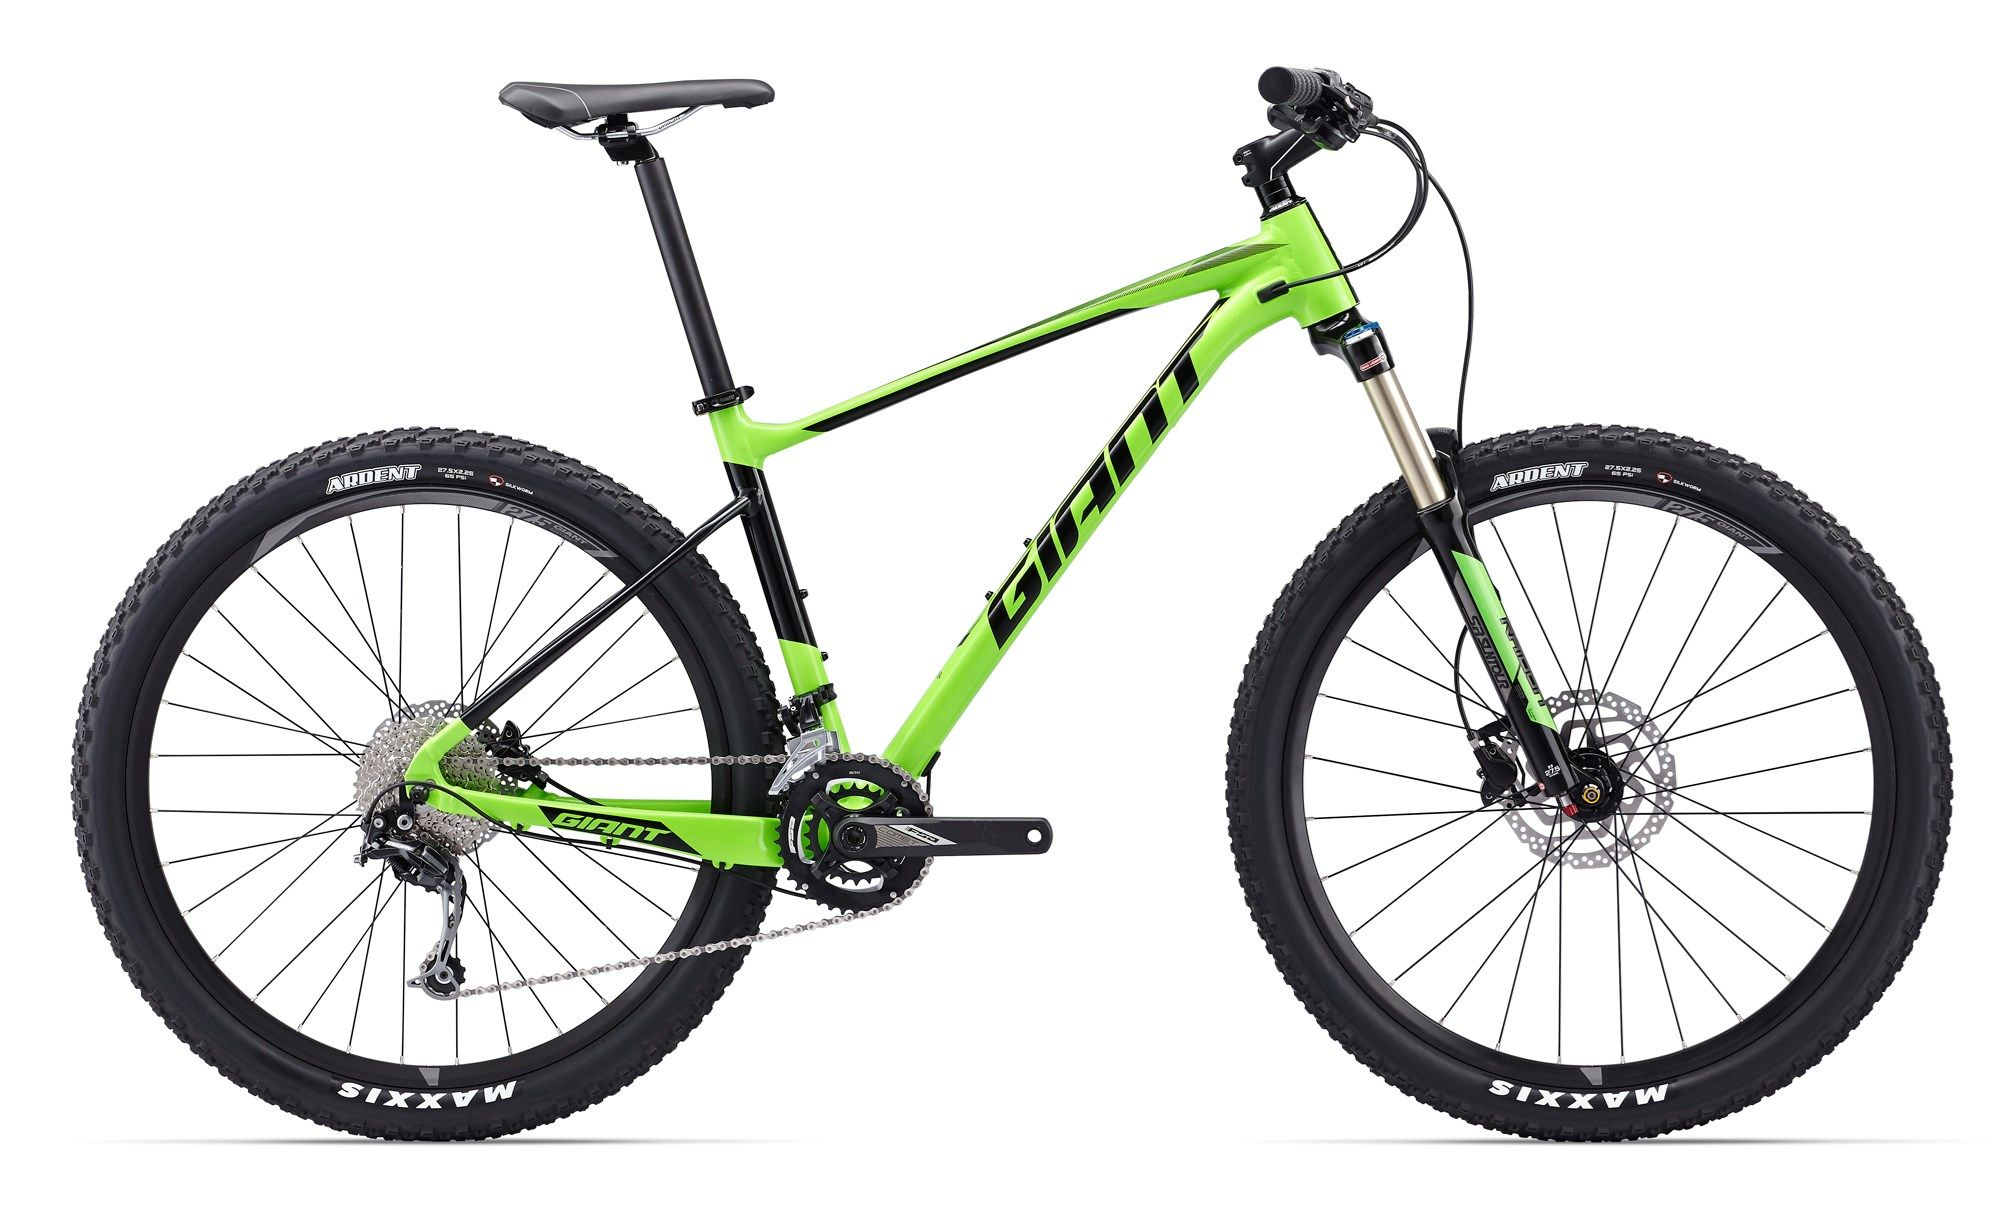 Велосипед Giant Fathom 2 2017 велосипед giant tcr advanced 2 compact 2013